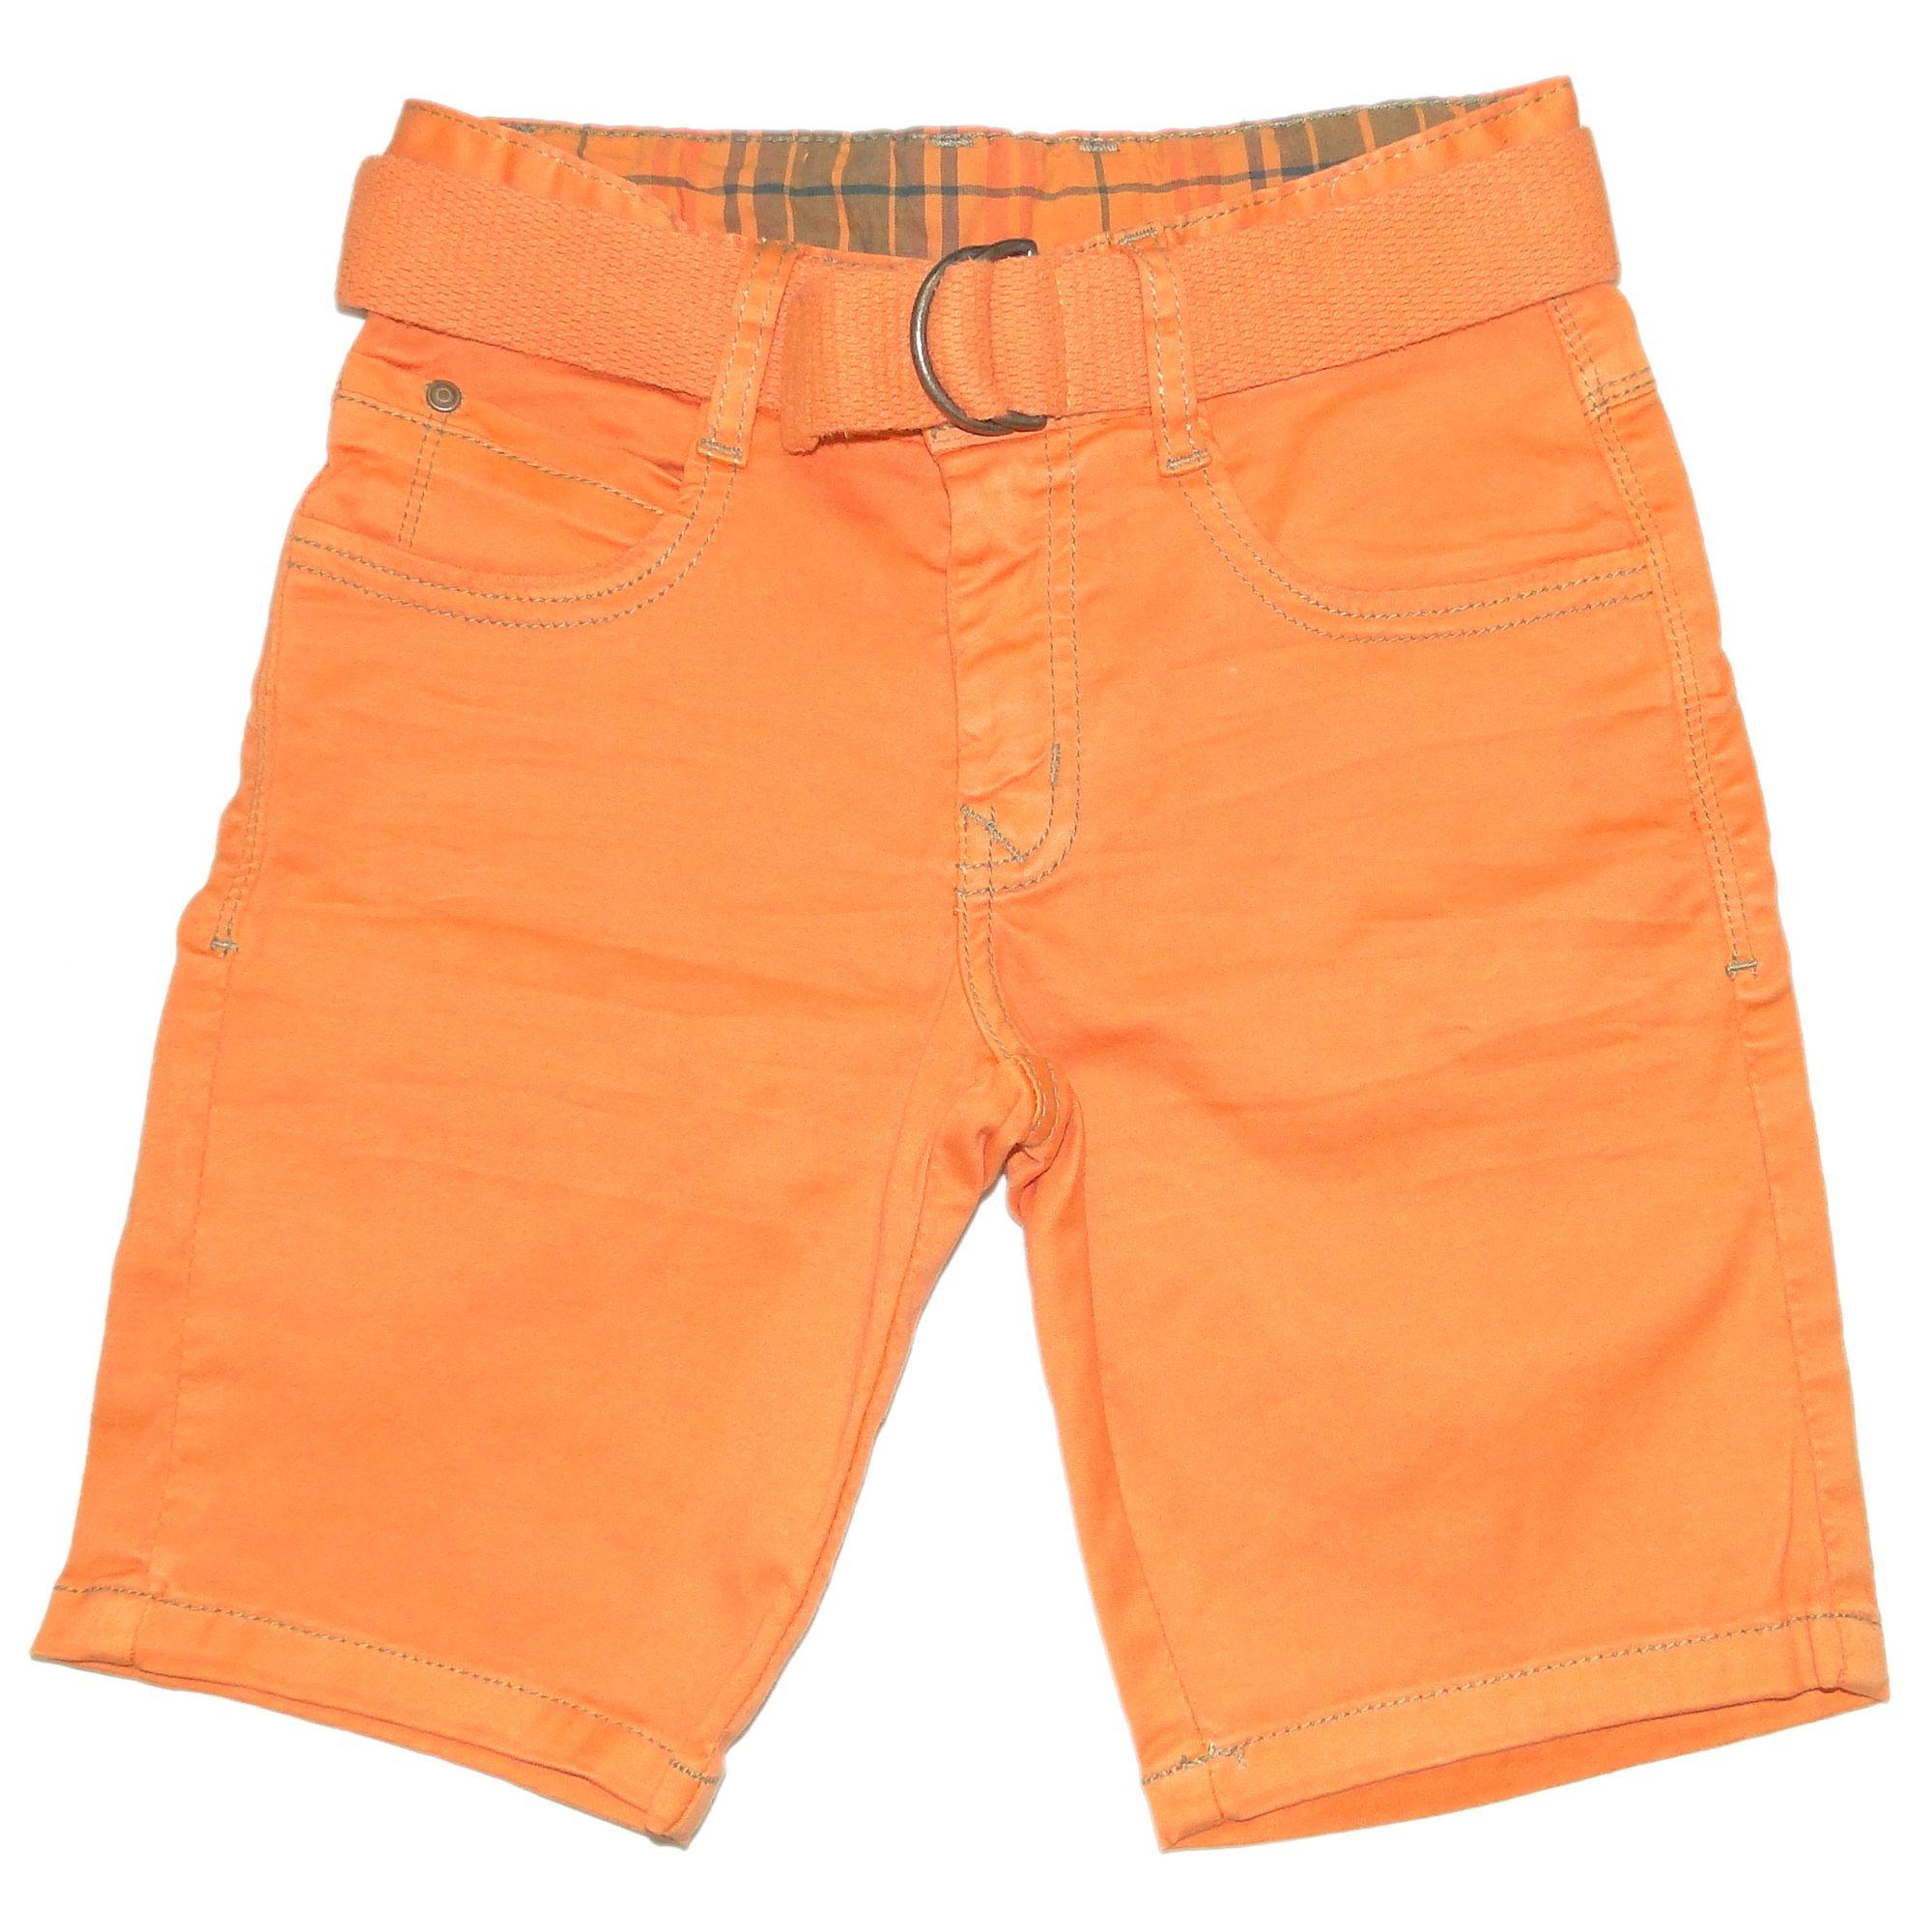 bermuda-menino-laranja-joy-by-morena-rosa